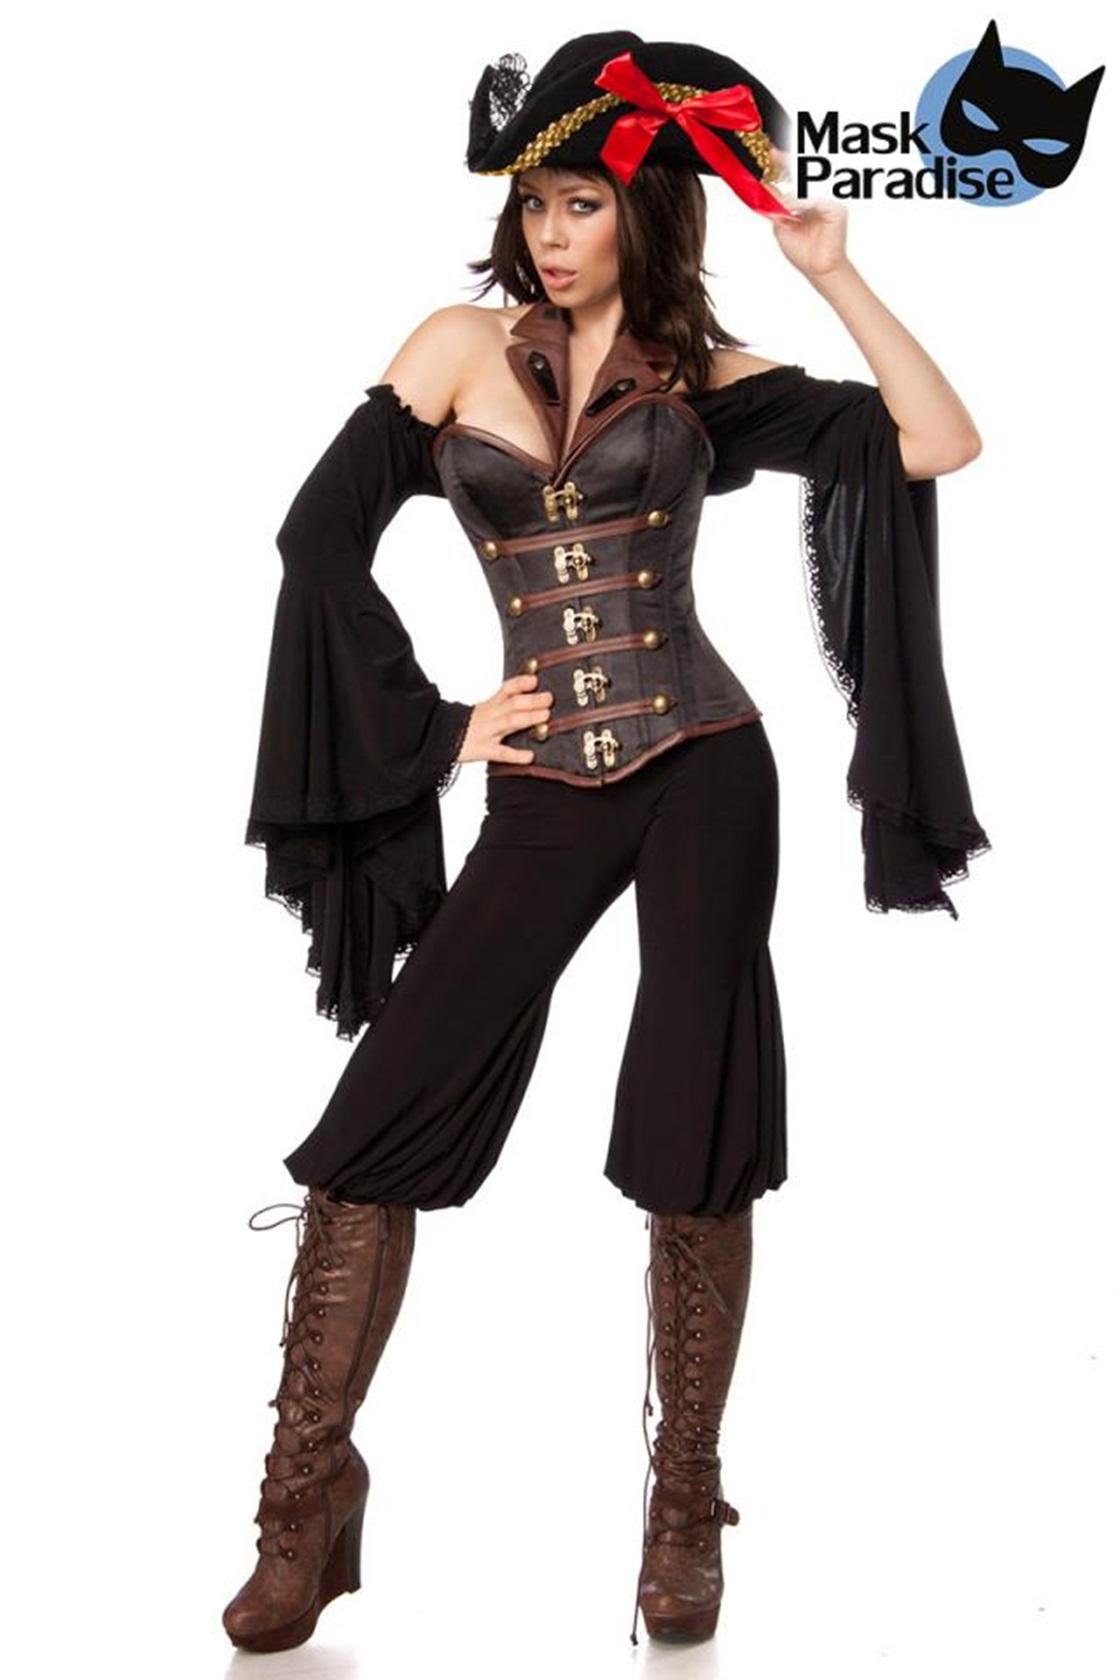 80120 Piratenkostüm Female Pirate von Mask Paradise  EAN: 4251302117958